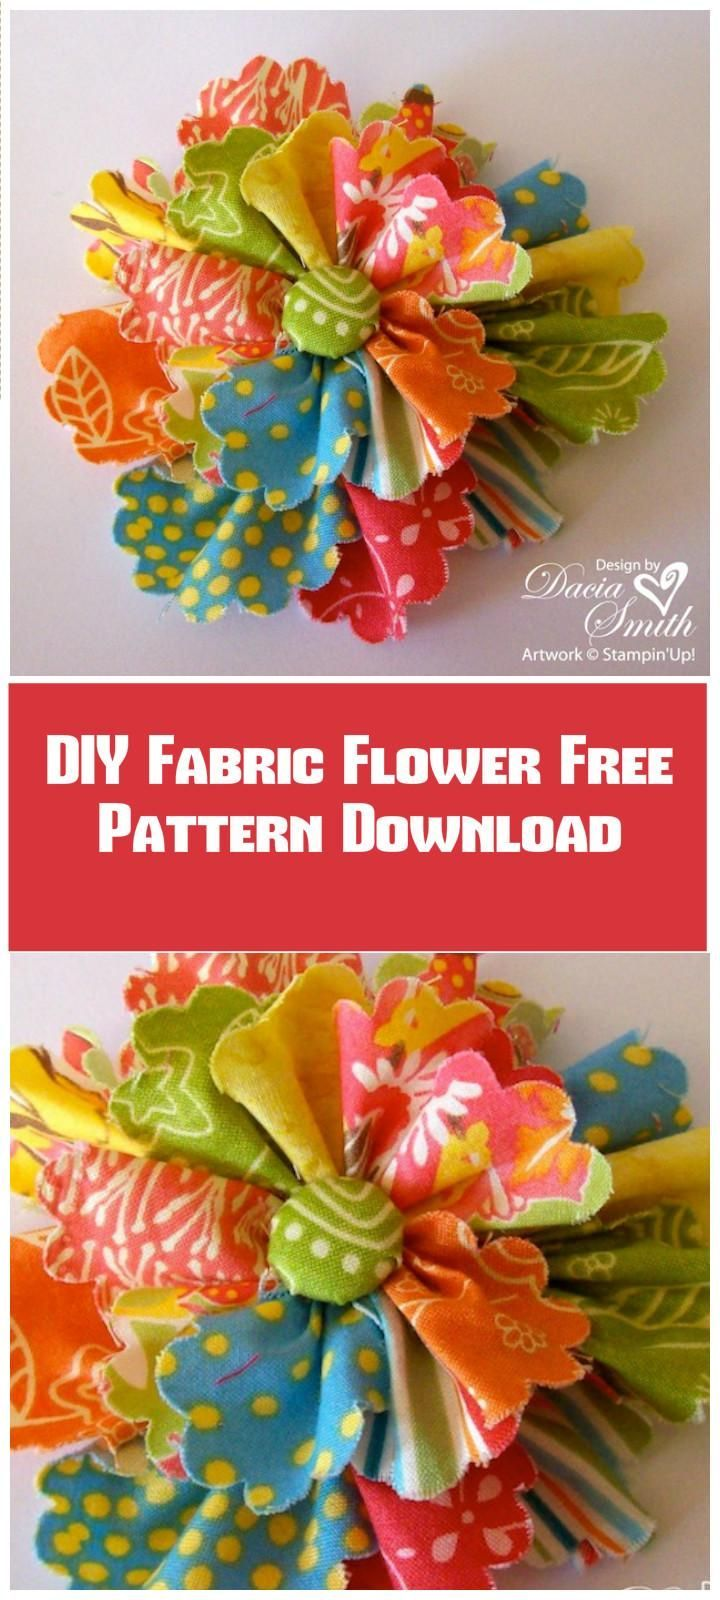 25+ Best Ideas About Fabric Flower Tutorial On Pinterest